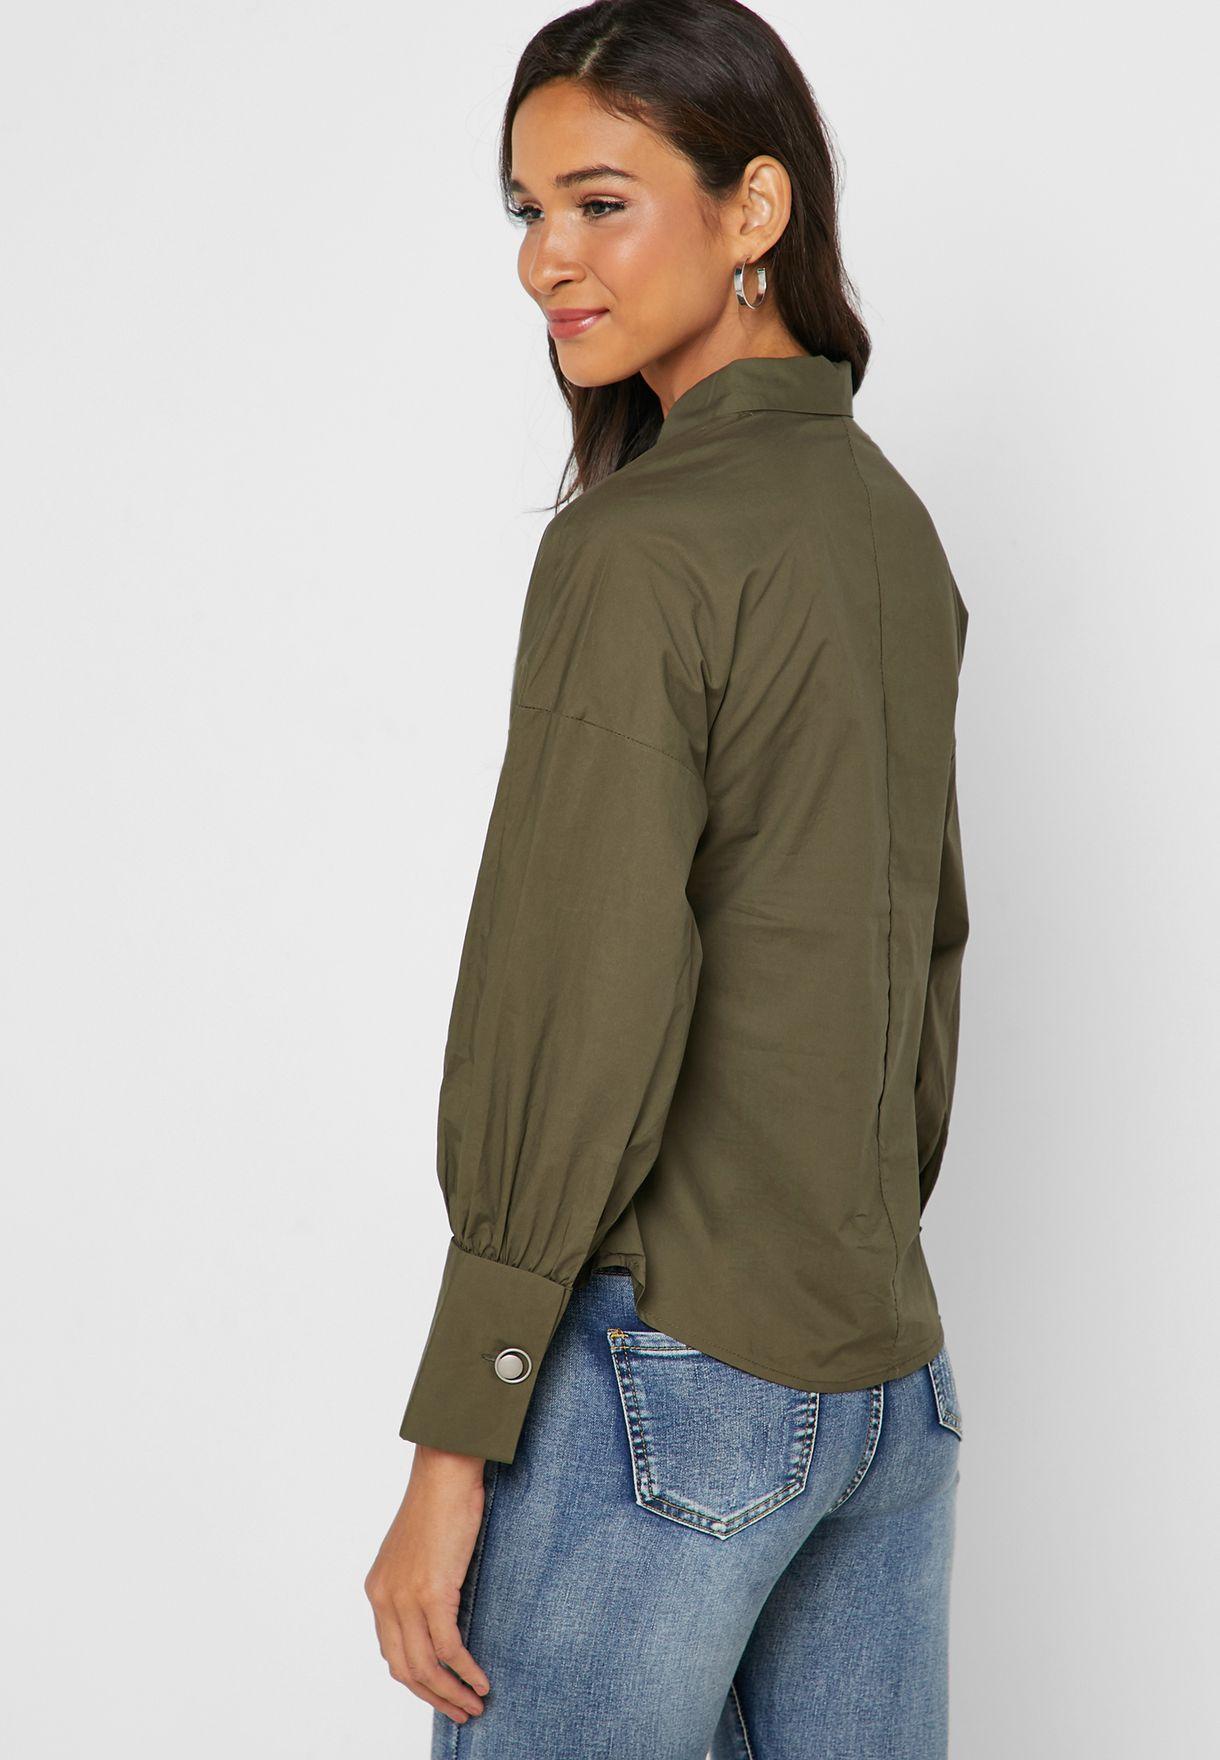 Ring Detail Long Sleeve Shirt